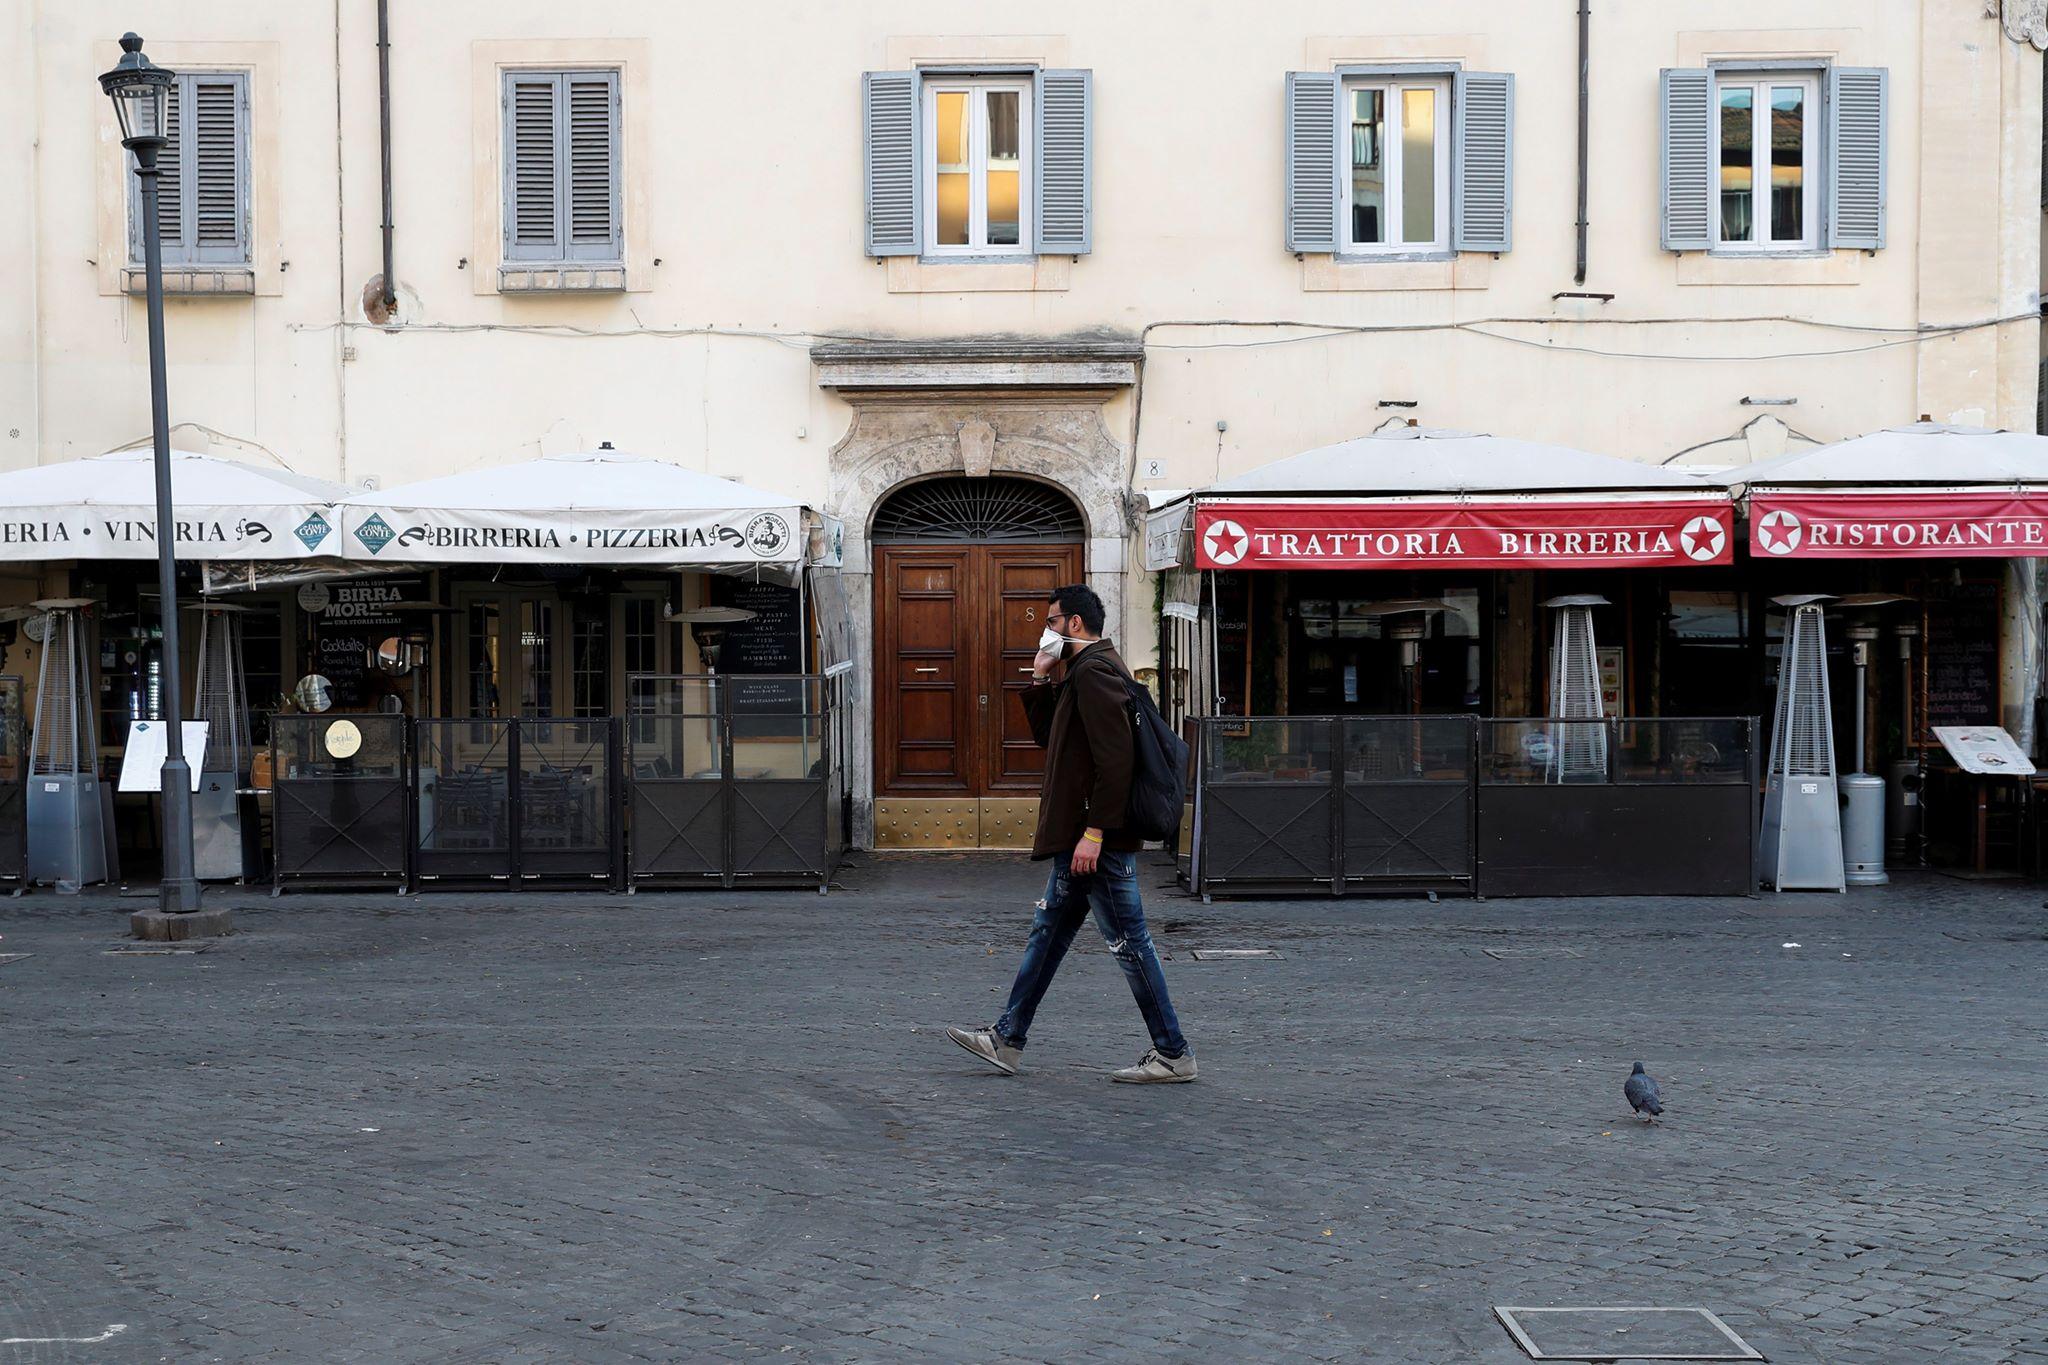 Eκτός ελέγχου η κατάσταση στην  Ιταλία! 168 νεκροί σε μία μέρα! Θερίζει ζωές ο κορονοϊός